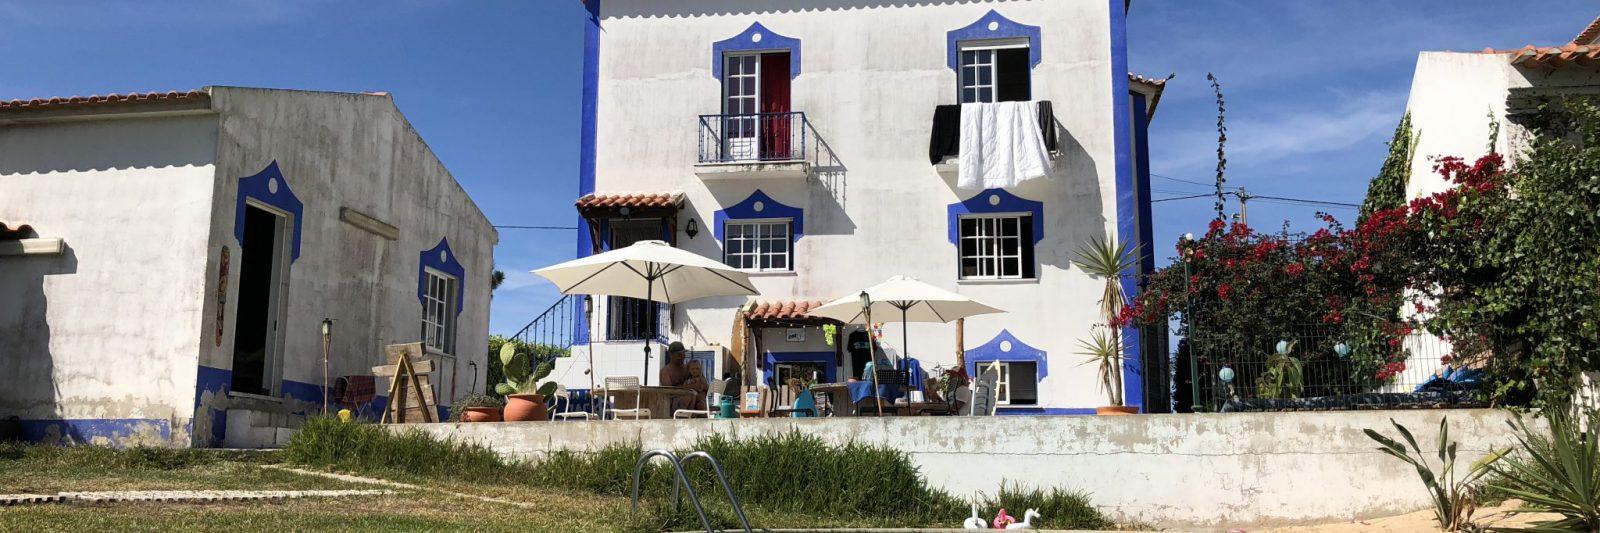 surfhouse surf surfschool santa cruz portugal vakantie holiday terras drone swimmingpool garden